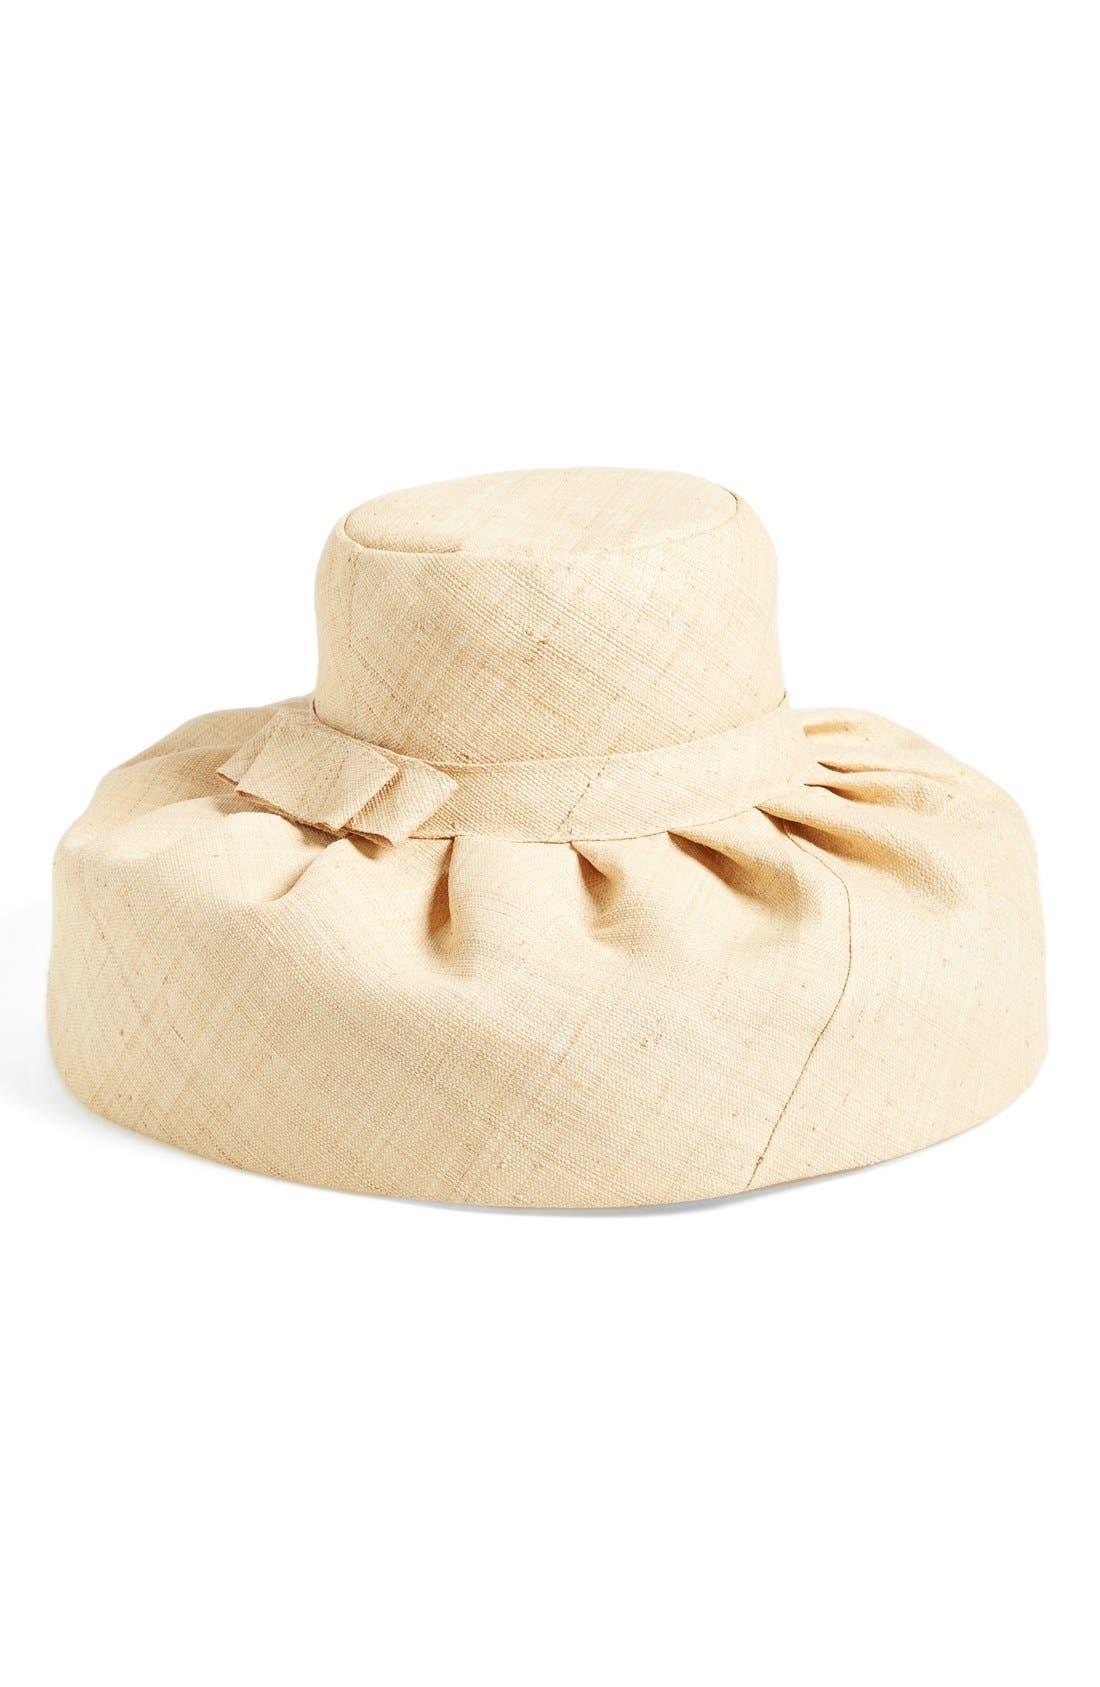 Main Image - PilyQ Sun Hat